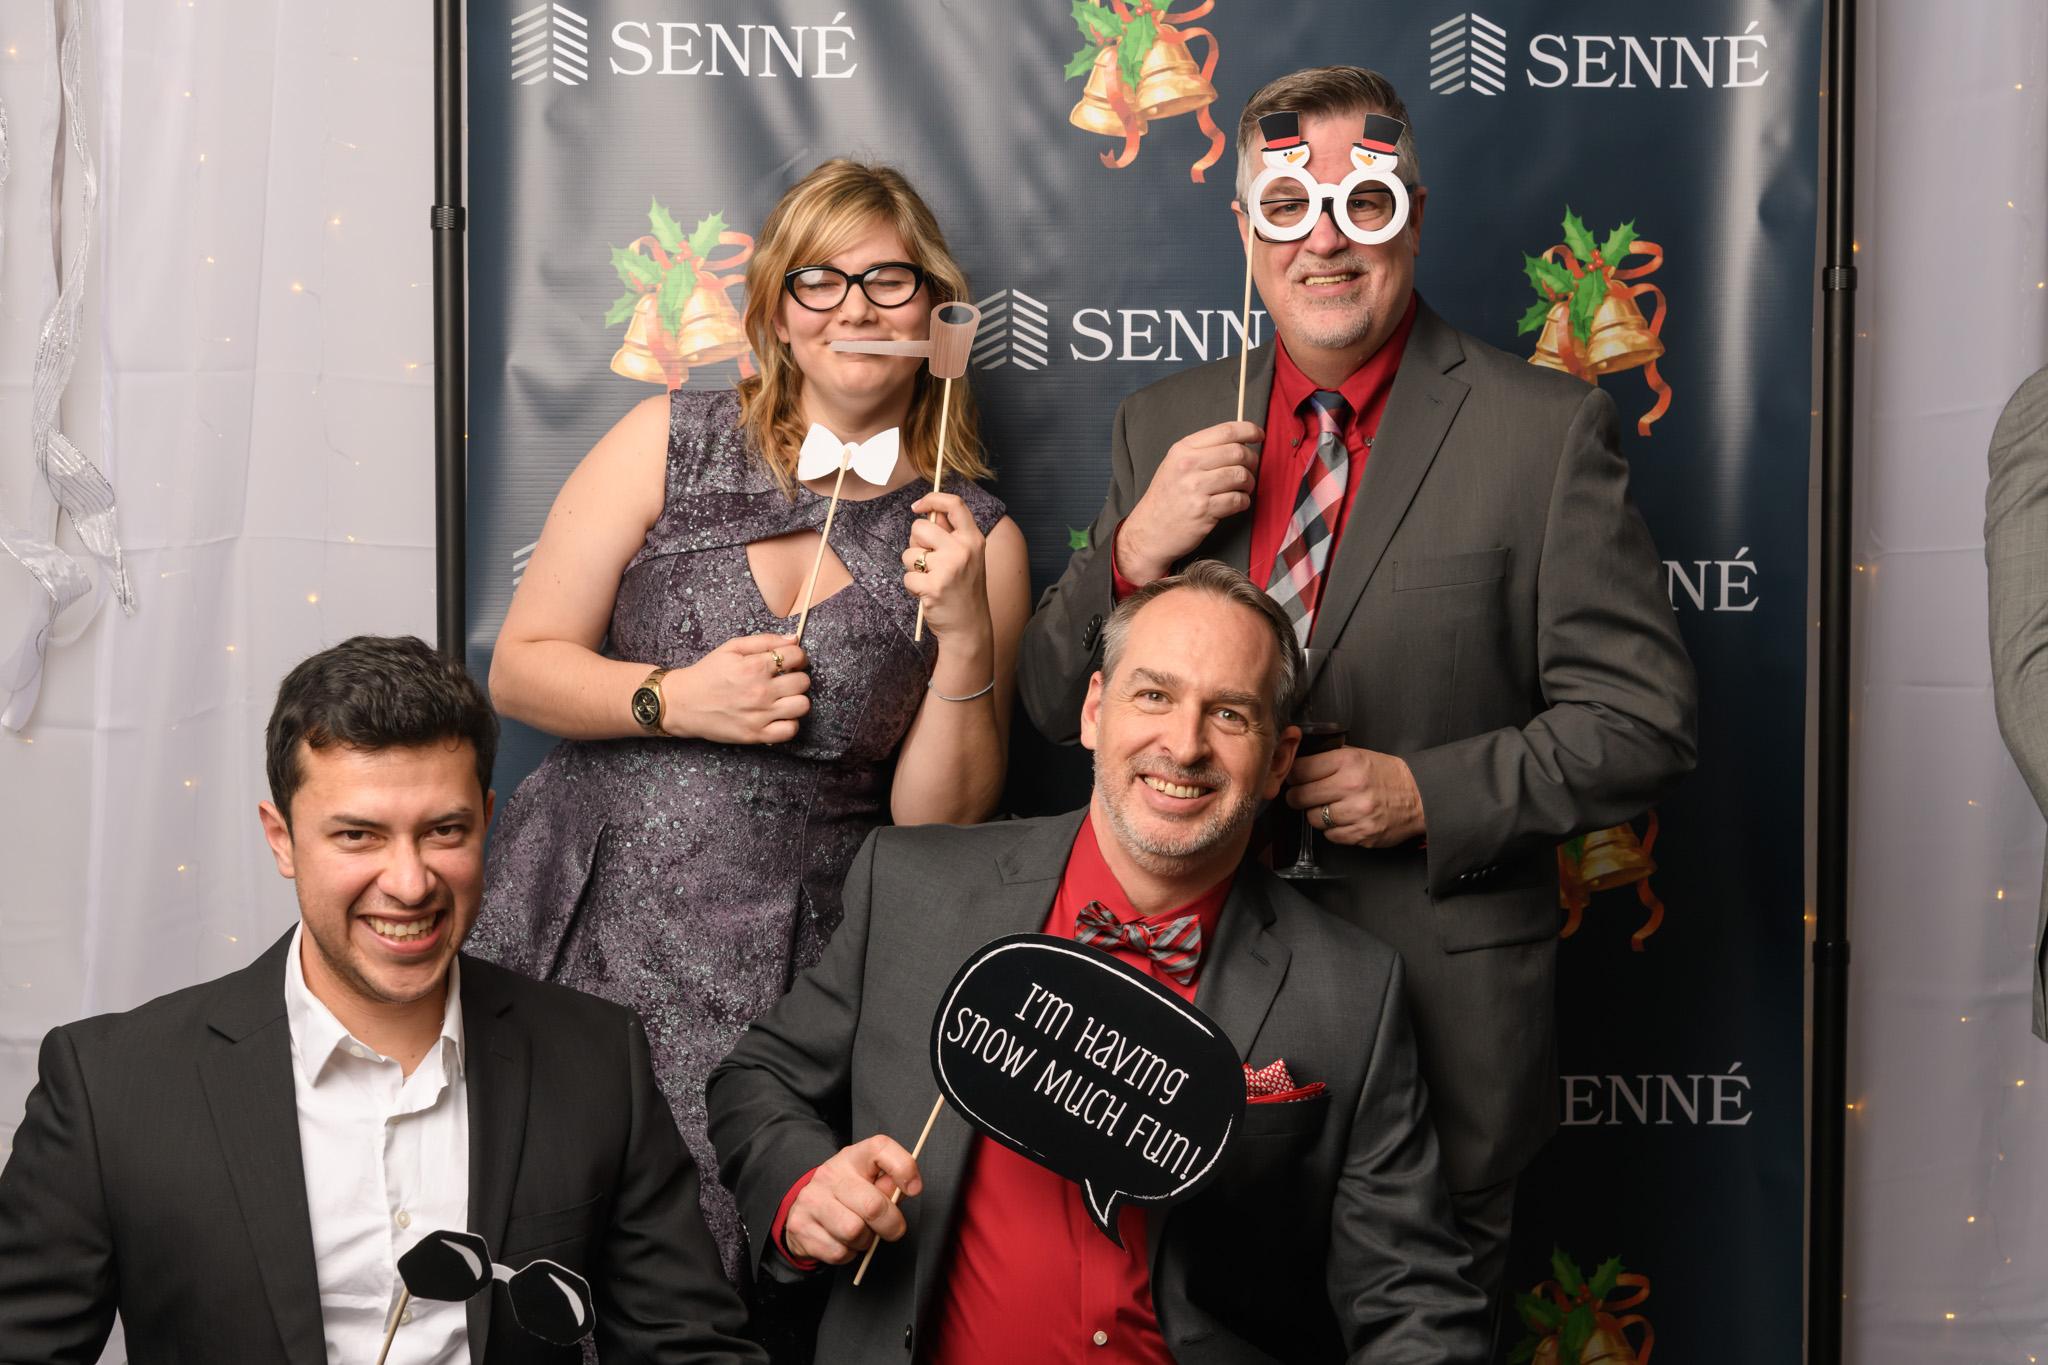 senne-winter-party-2018--0018.jpg